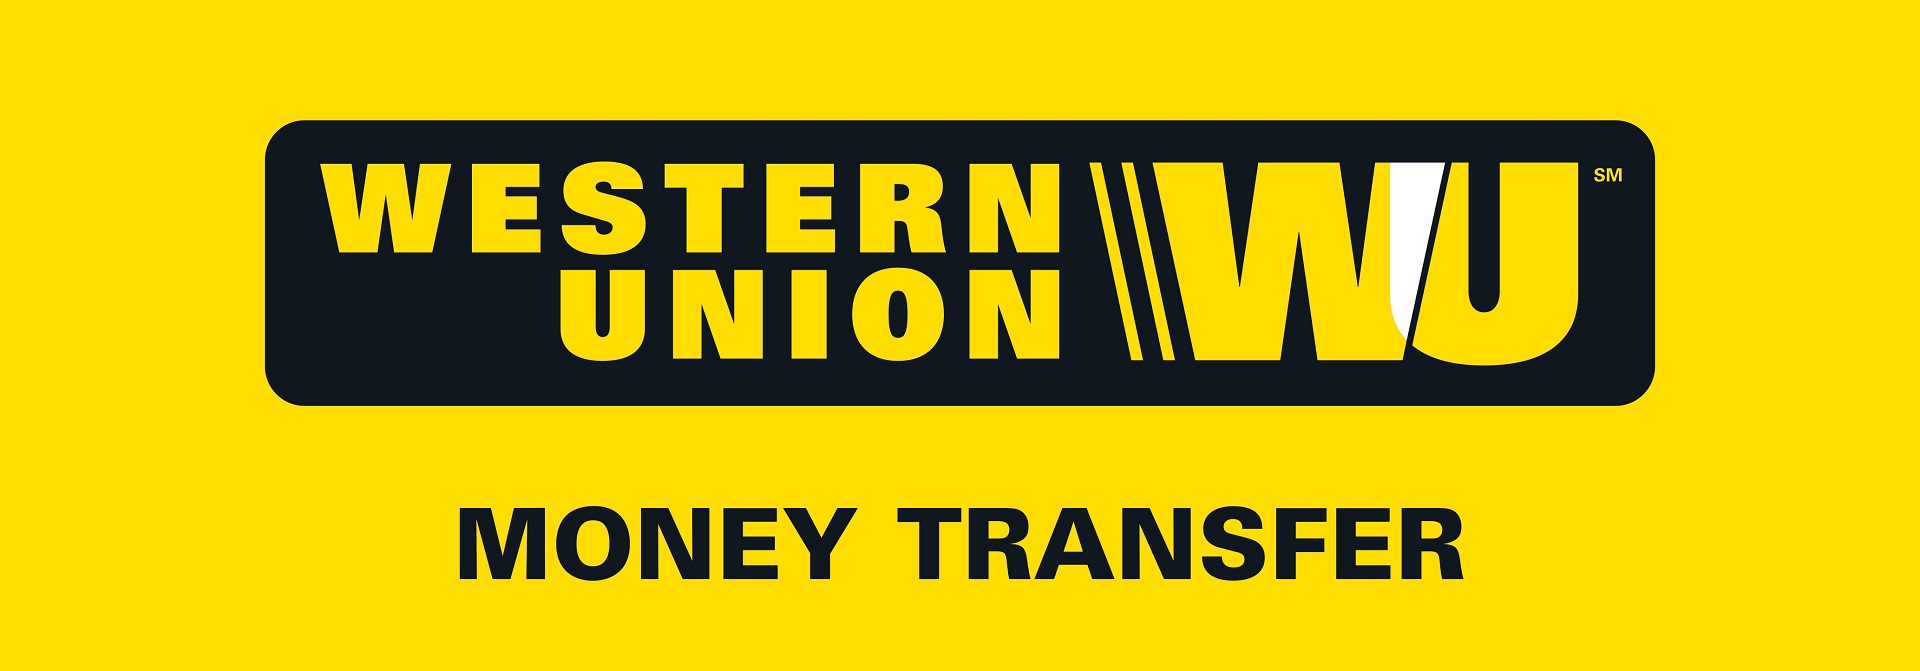 Logotip Western Union